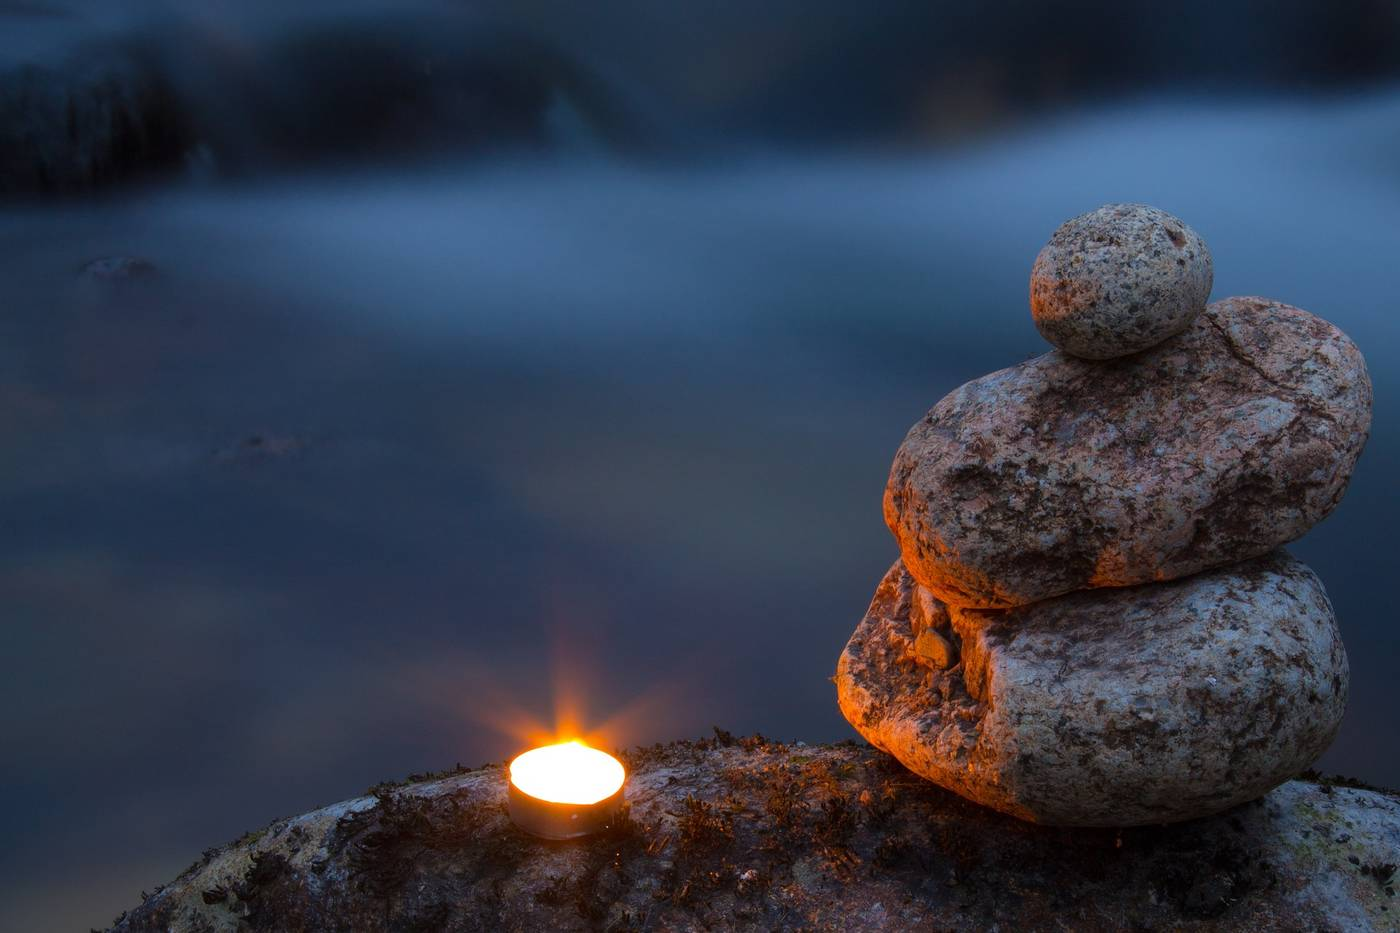 Lit candle next to Zen stones